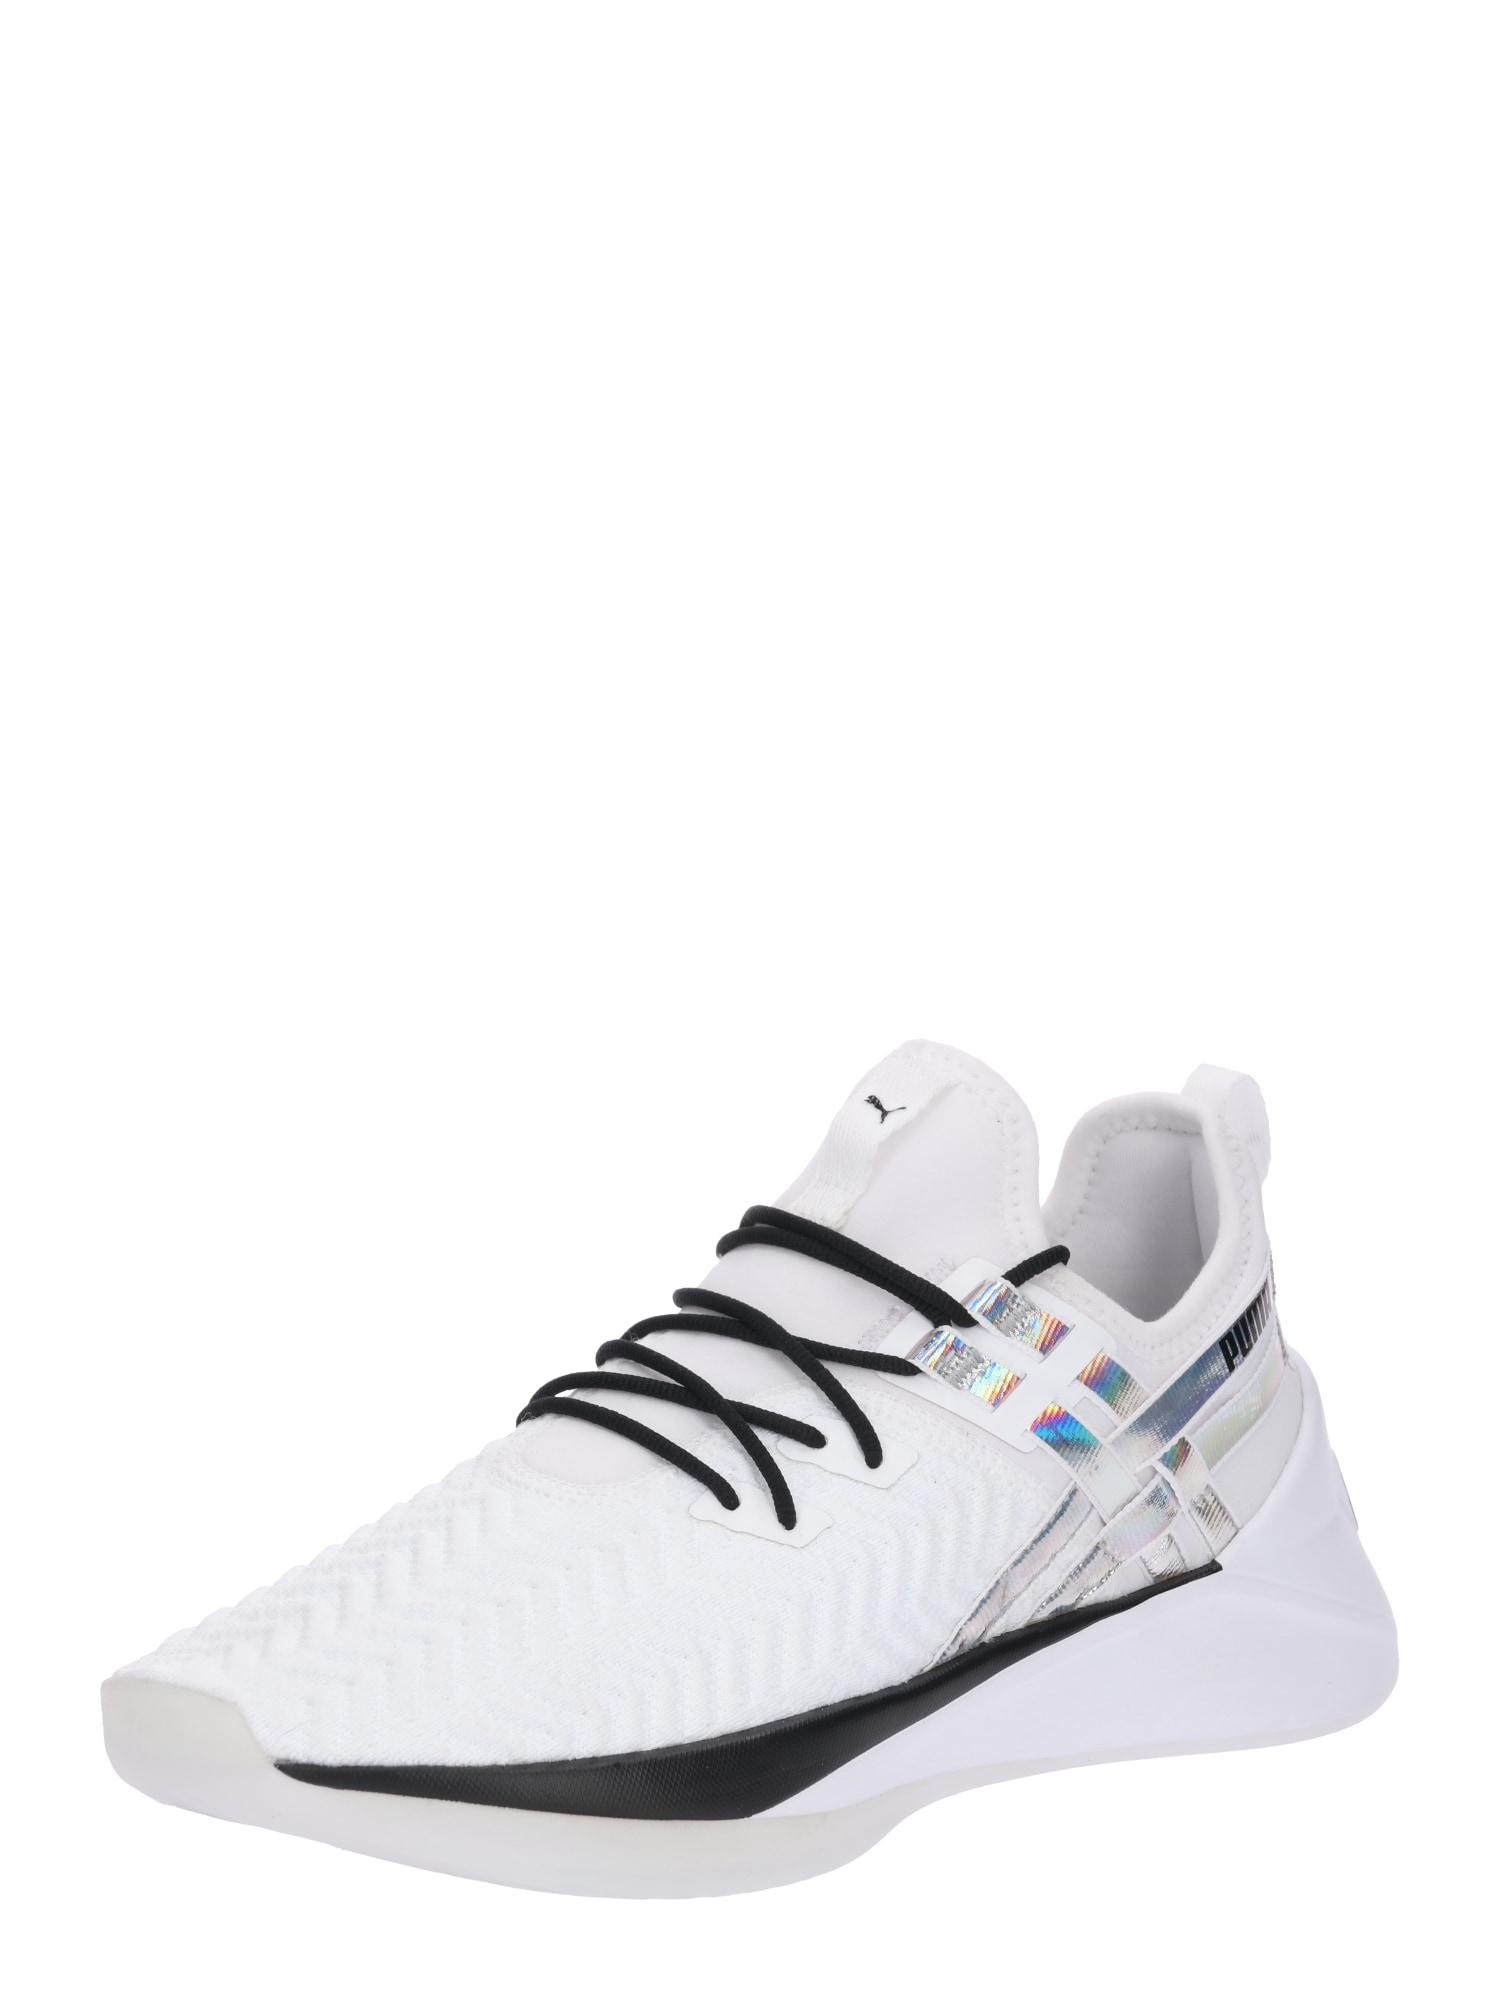 Sportovní boty Jaab XT Iridescent TZ žlutá černá bílá PUMA